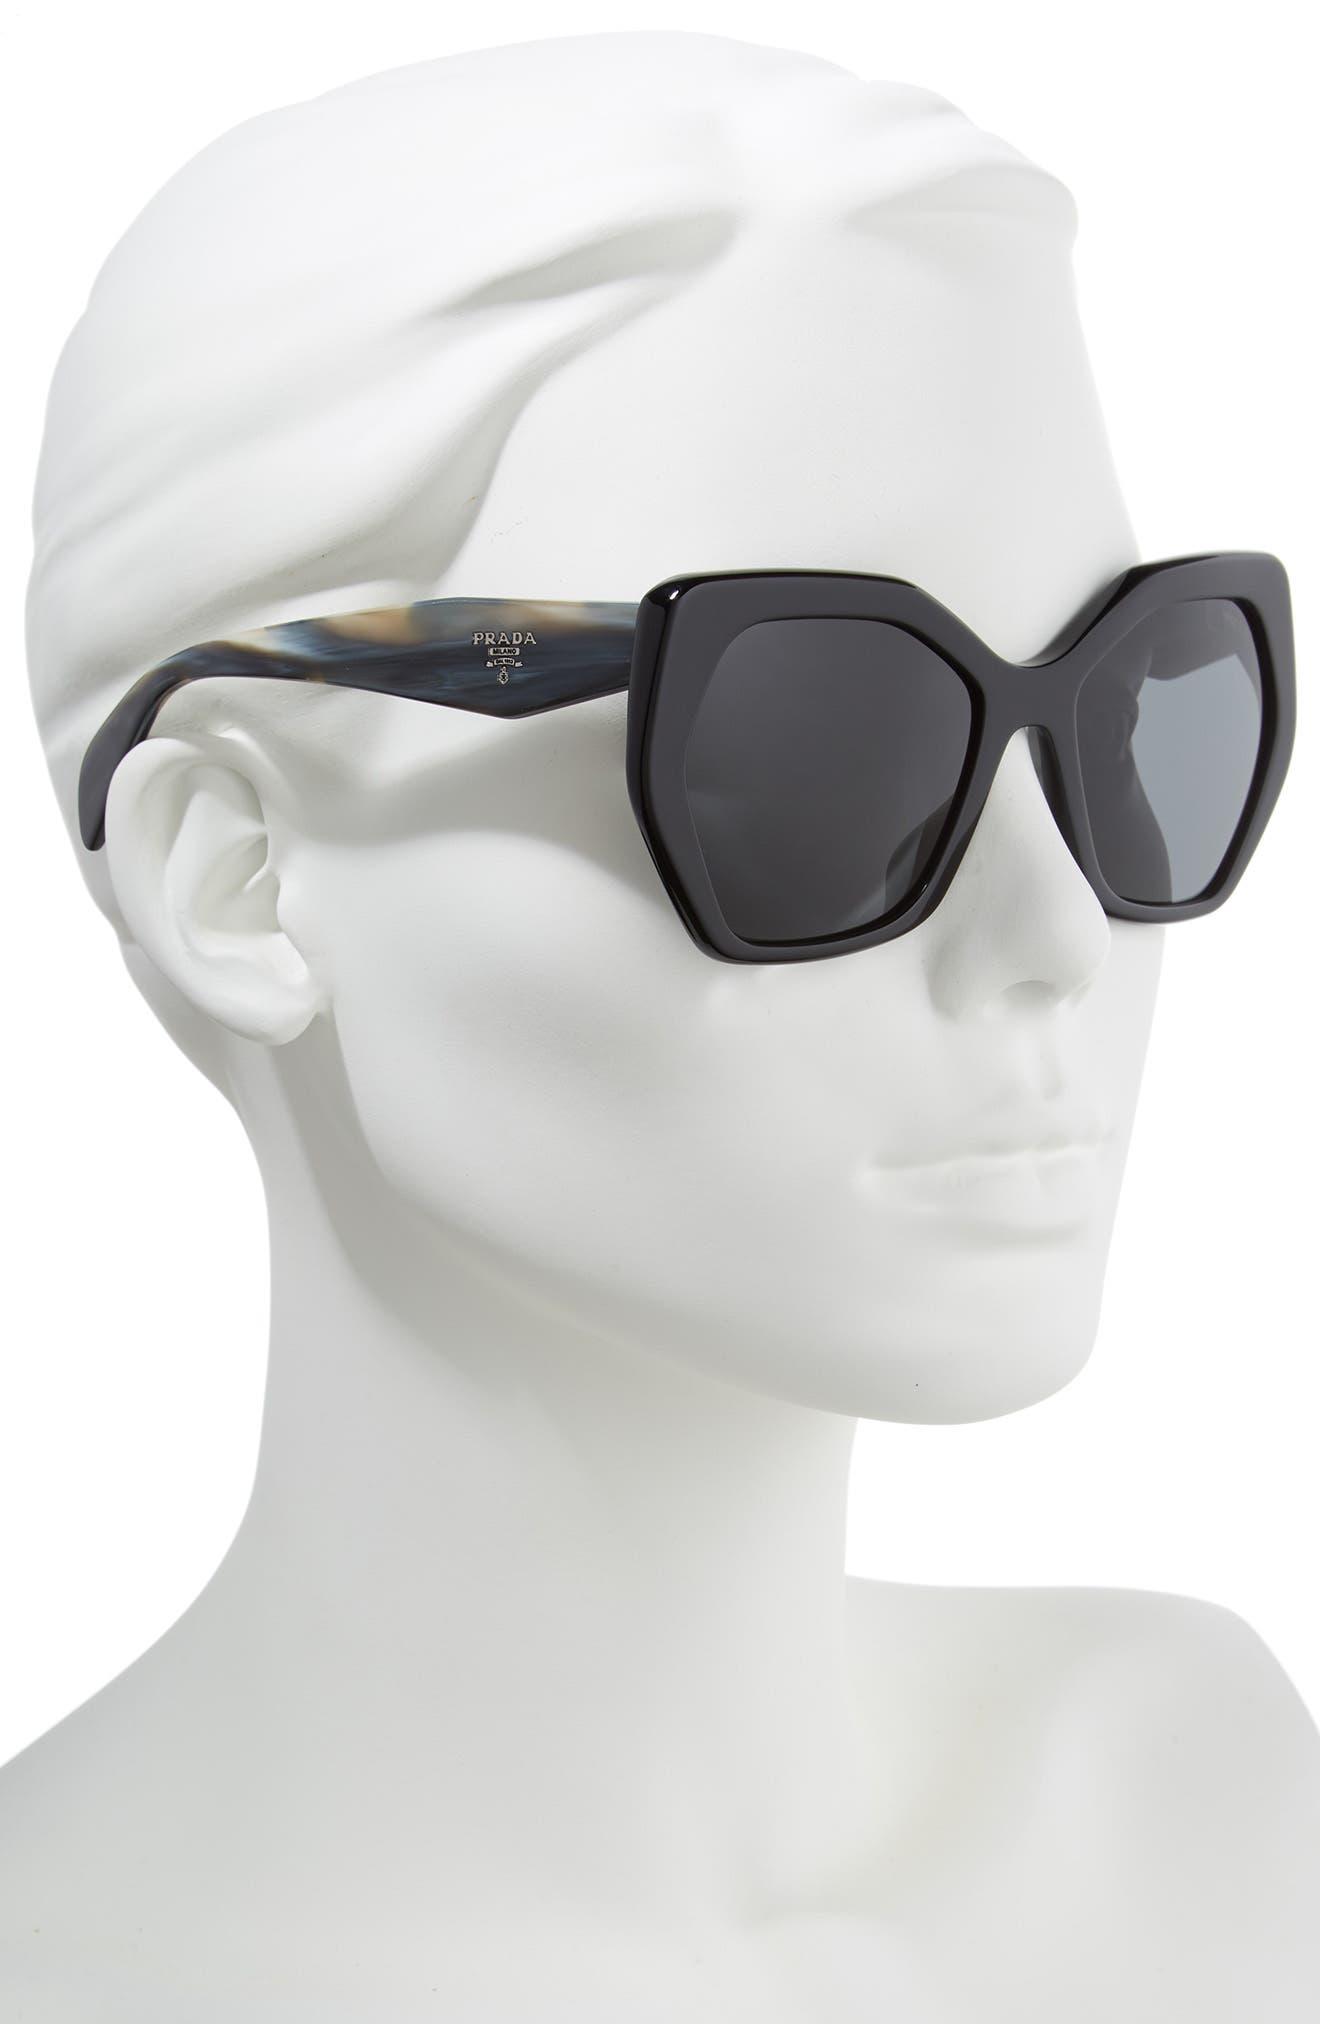 Heritage 56mm Sunglasses,                             Alternate thumbnail 2, color,                             BLACK SOLID